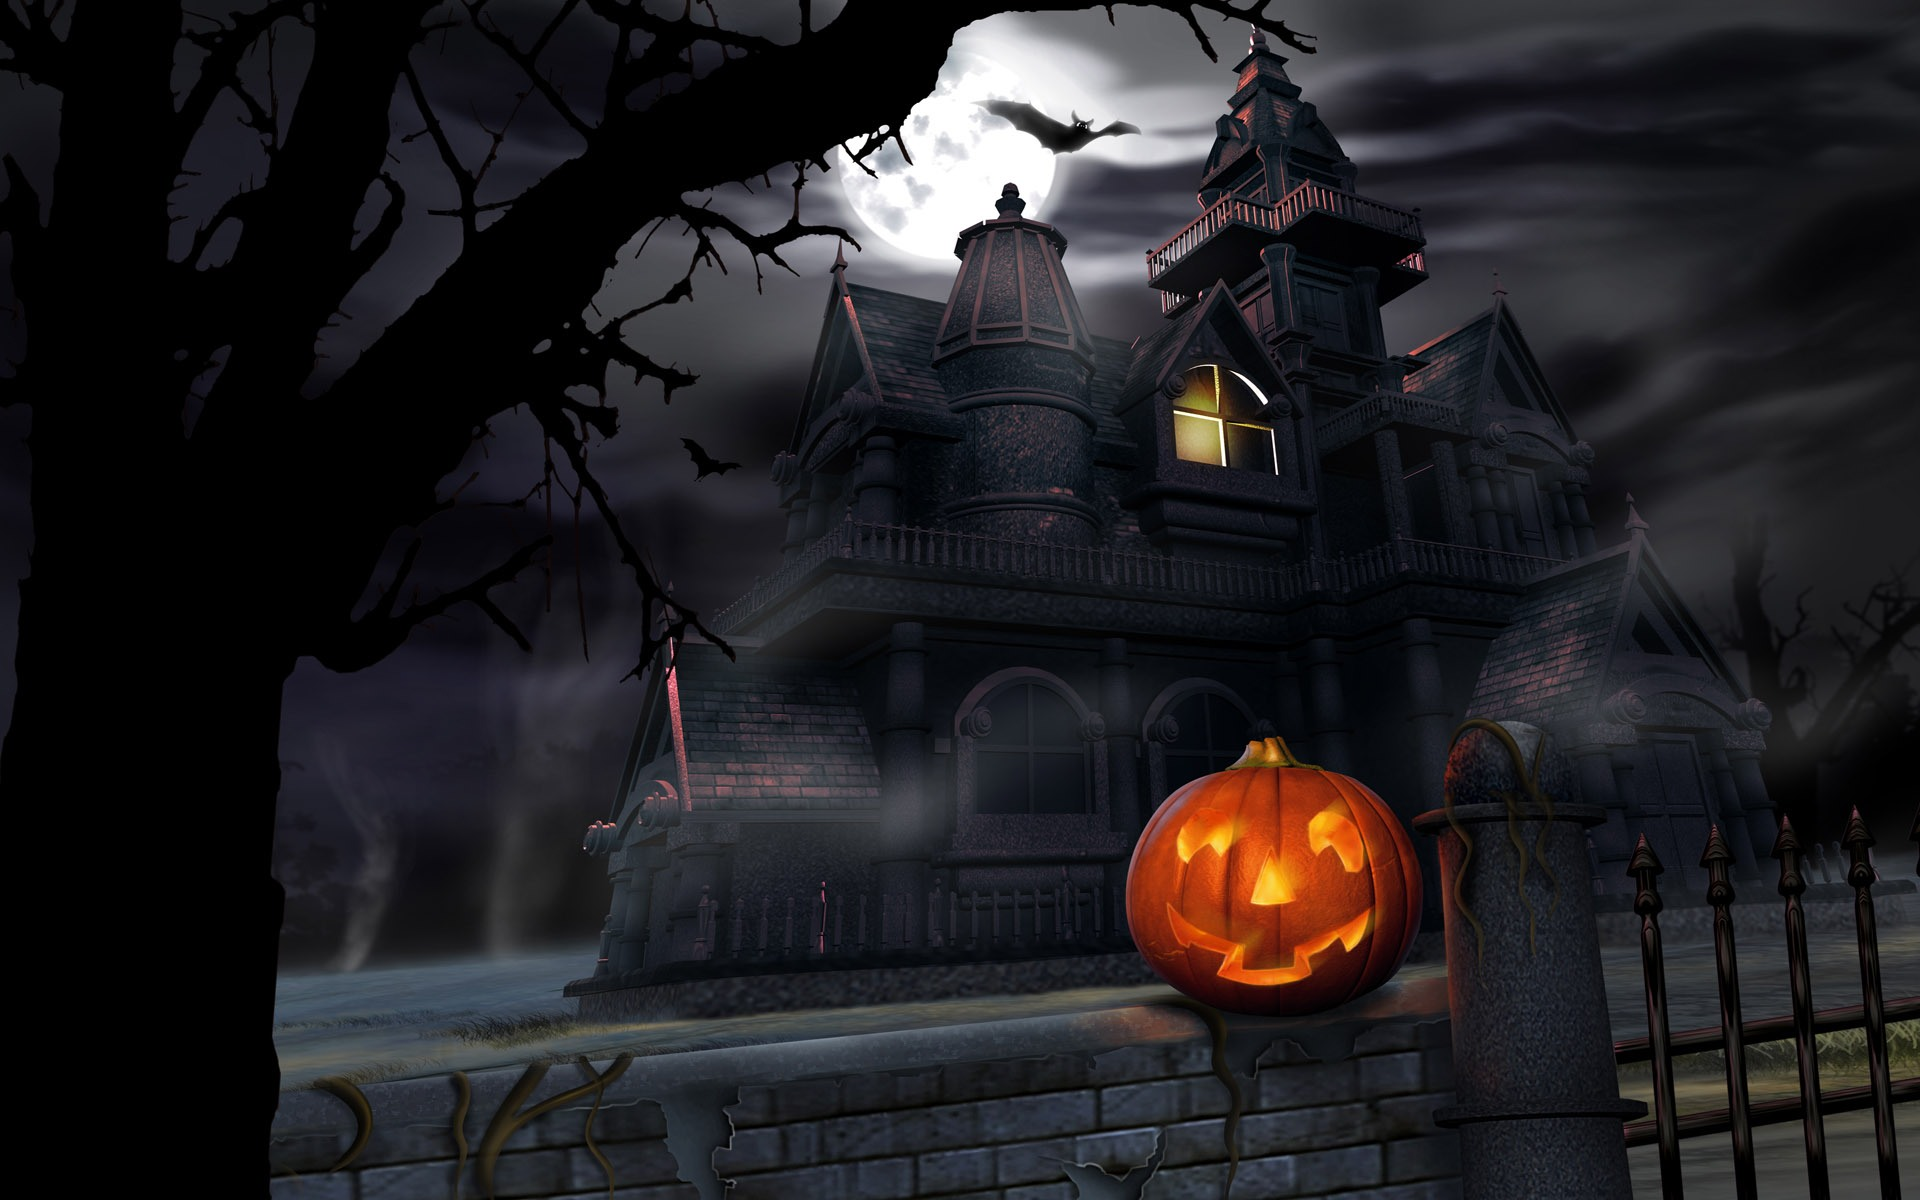 Haunted House Pumpkin desktop wallpaper 1920x1200